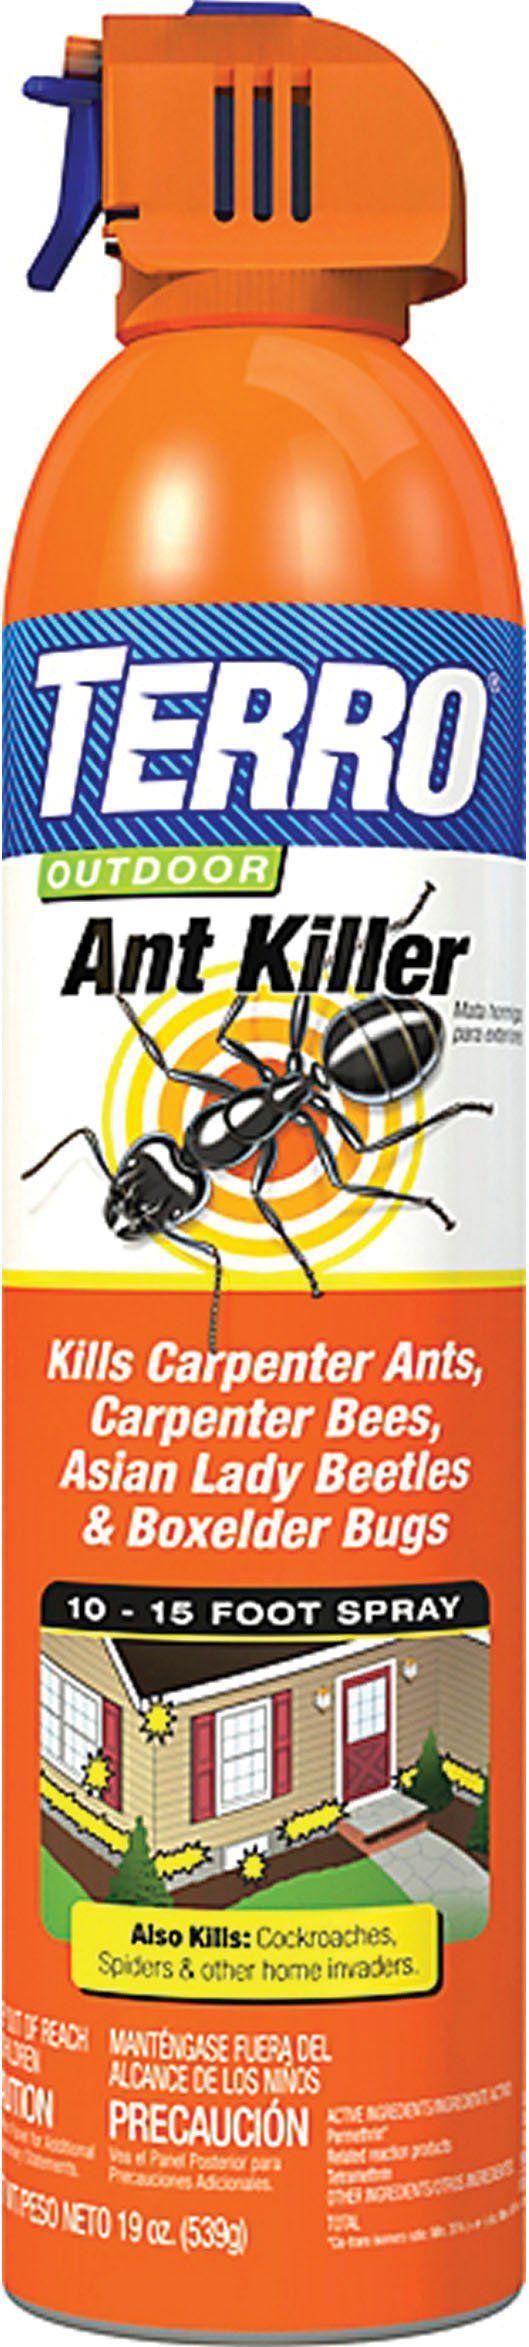 Senoret-Terro Outdoor Ant Killer Aerosol Spray 19 Ounce